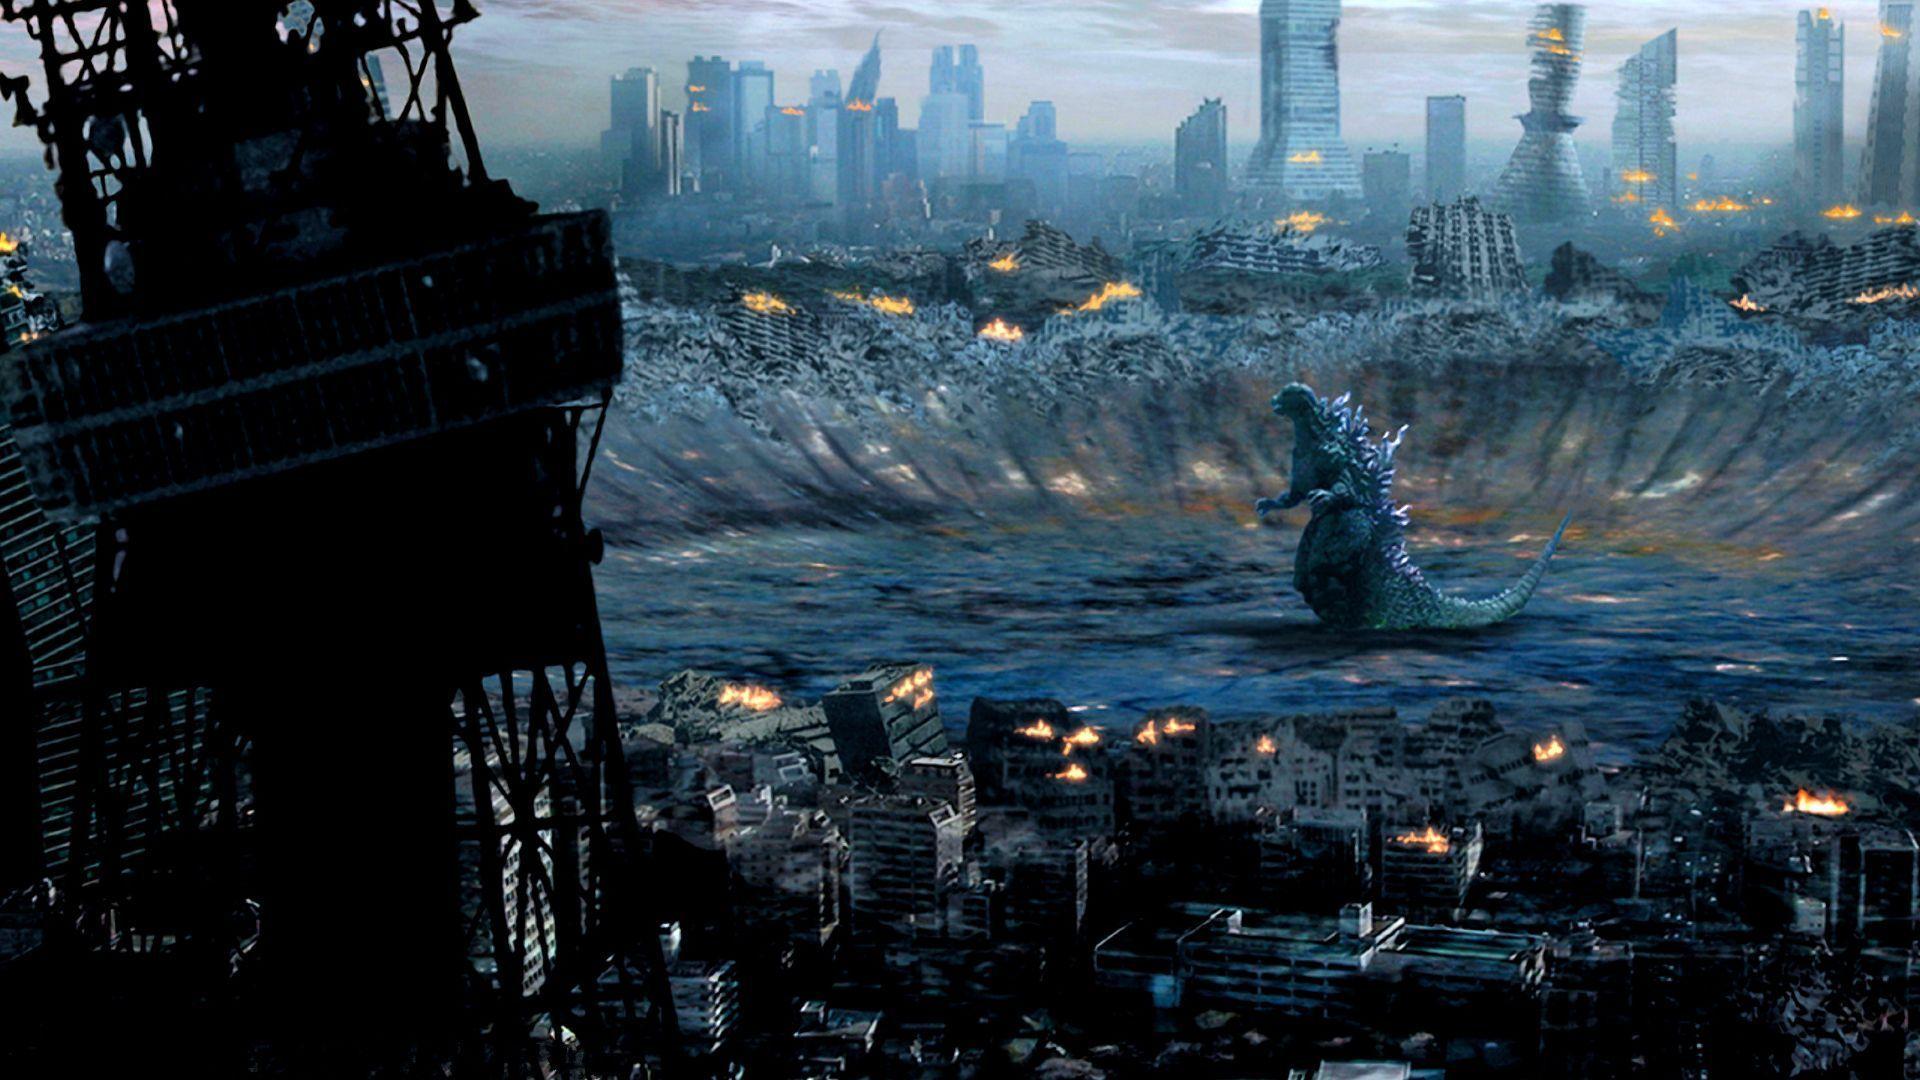 Godzilla goes booom | Godzilla | Godzilla wallpaper